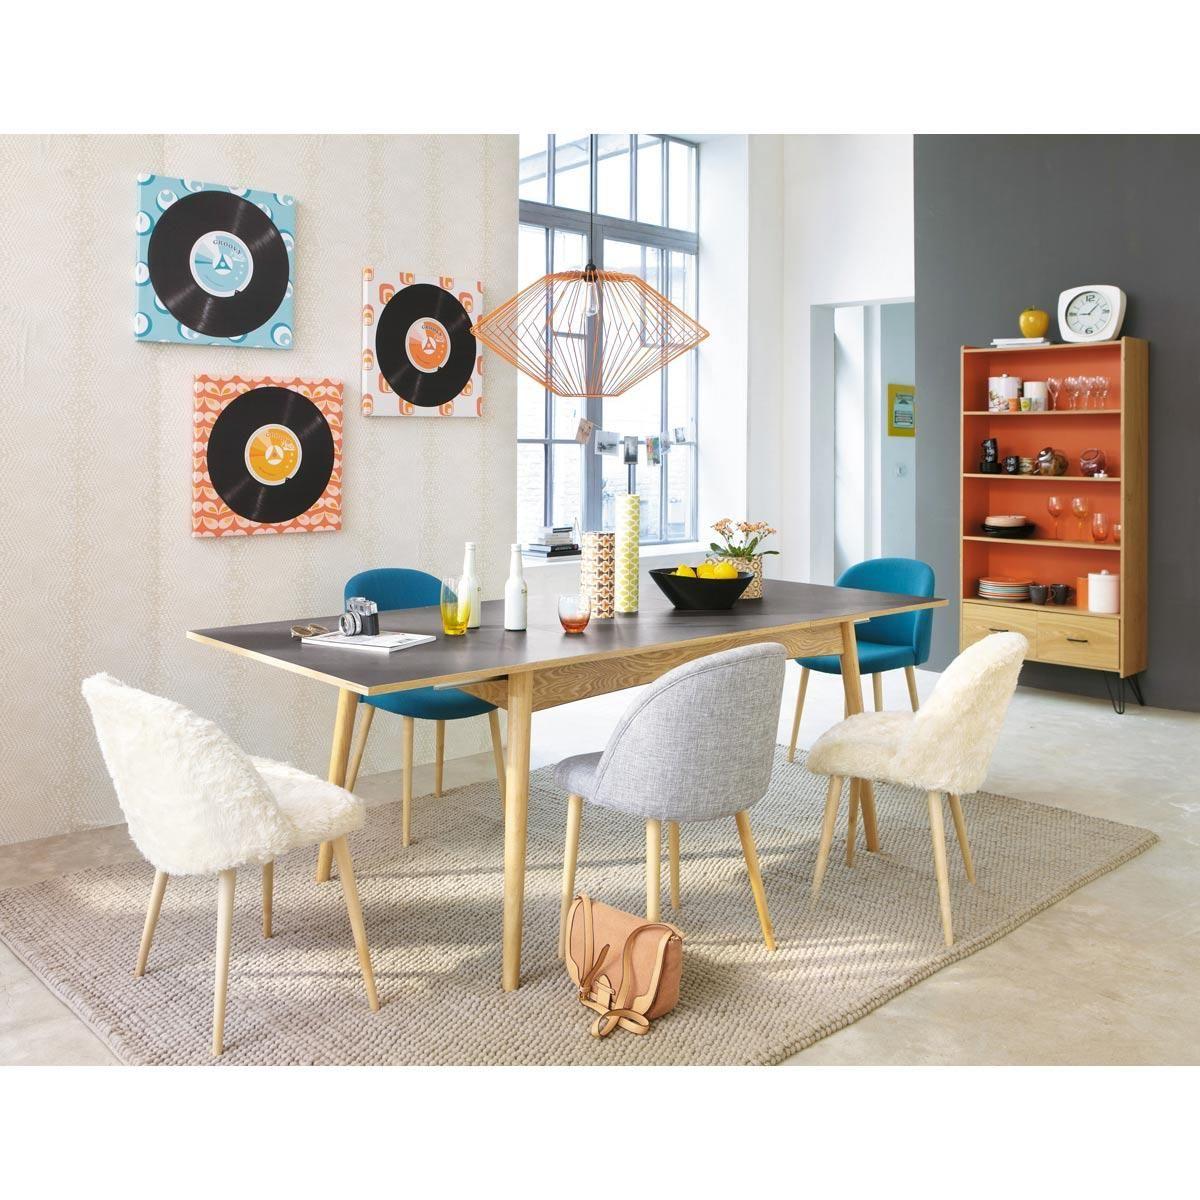 table manger extensible 6 10 personnes gris anthracite. Black Bedroom Furniture Sets. Home Design Ideas